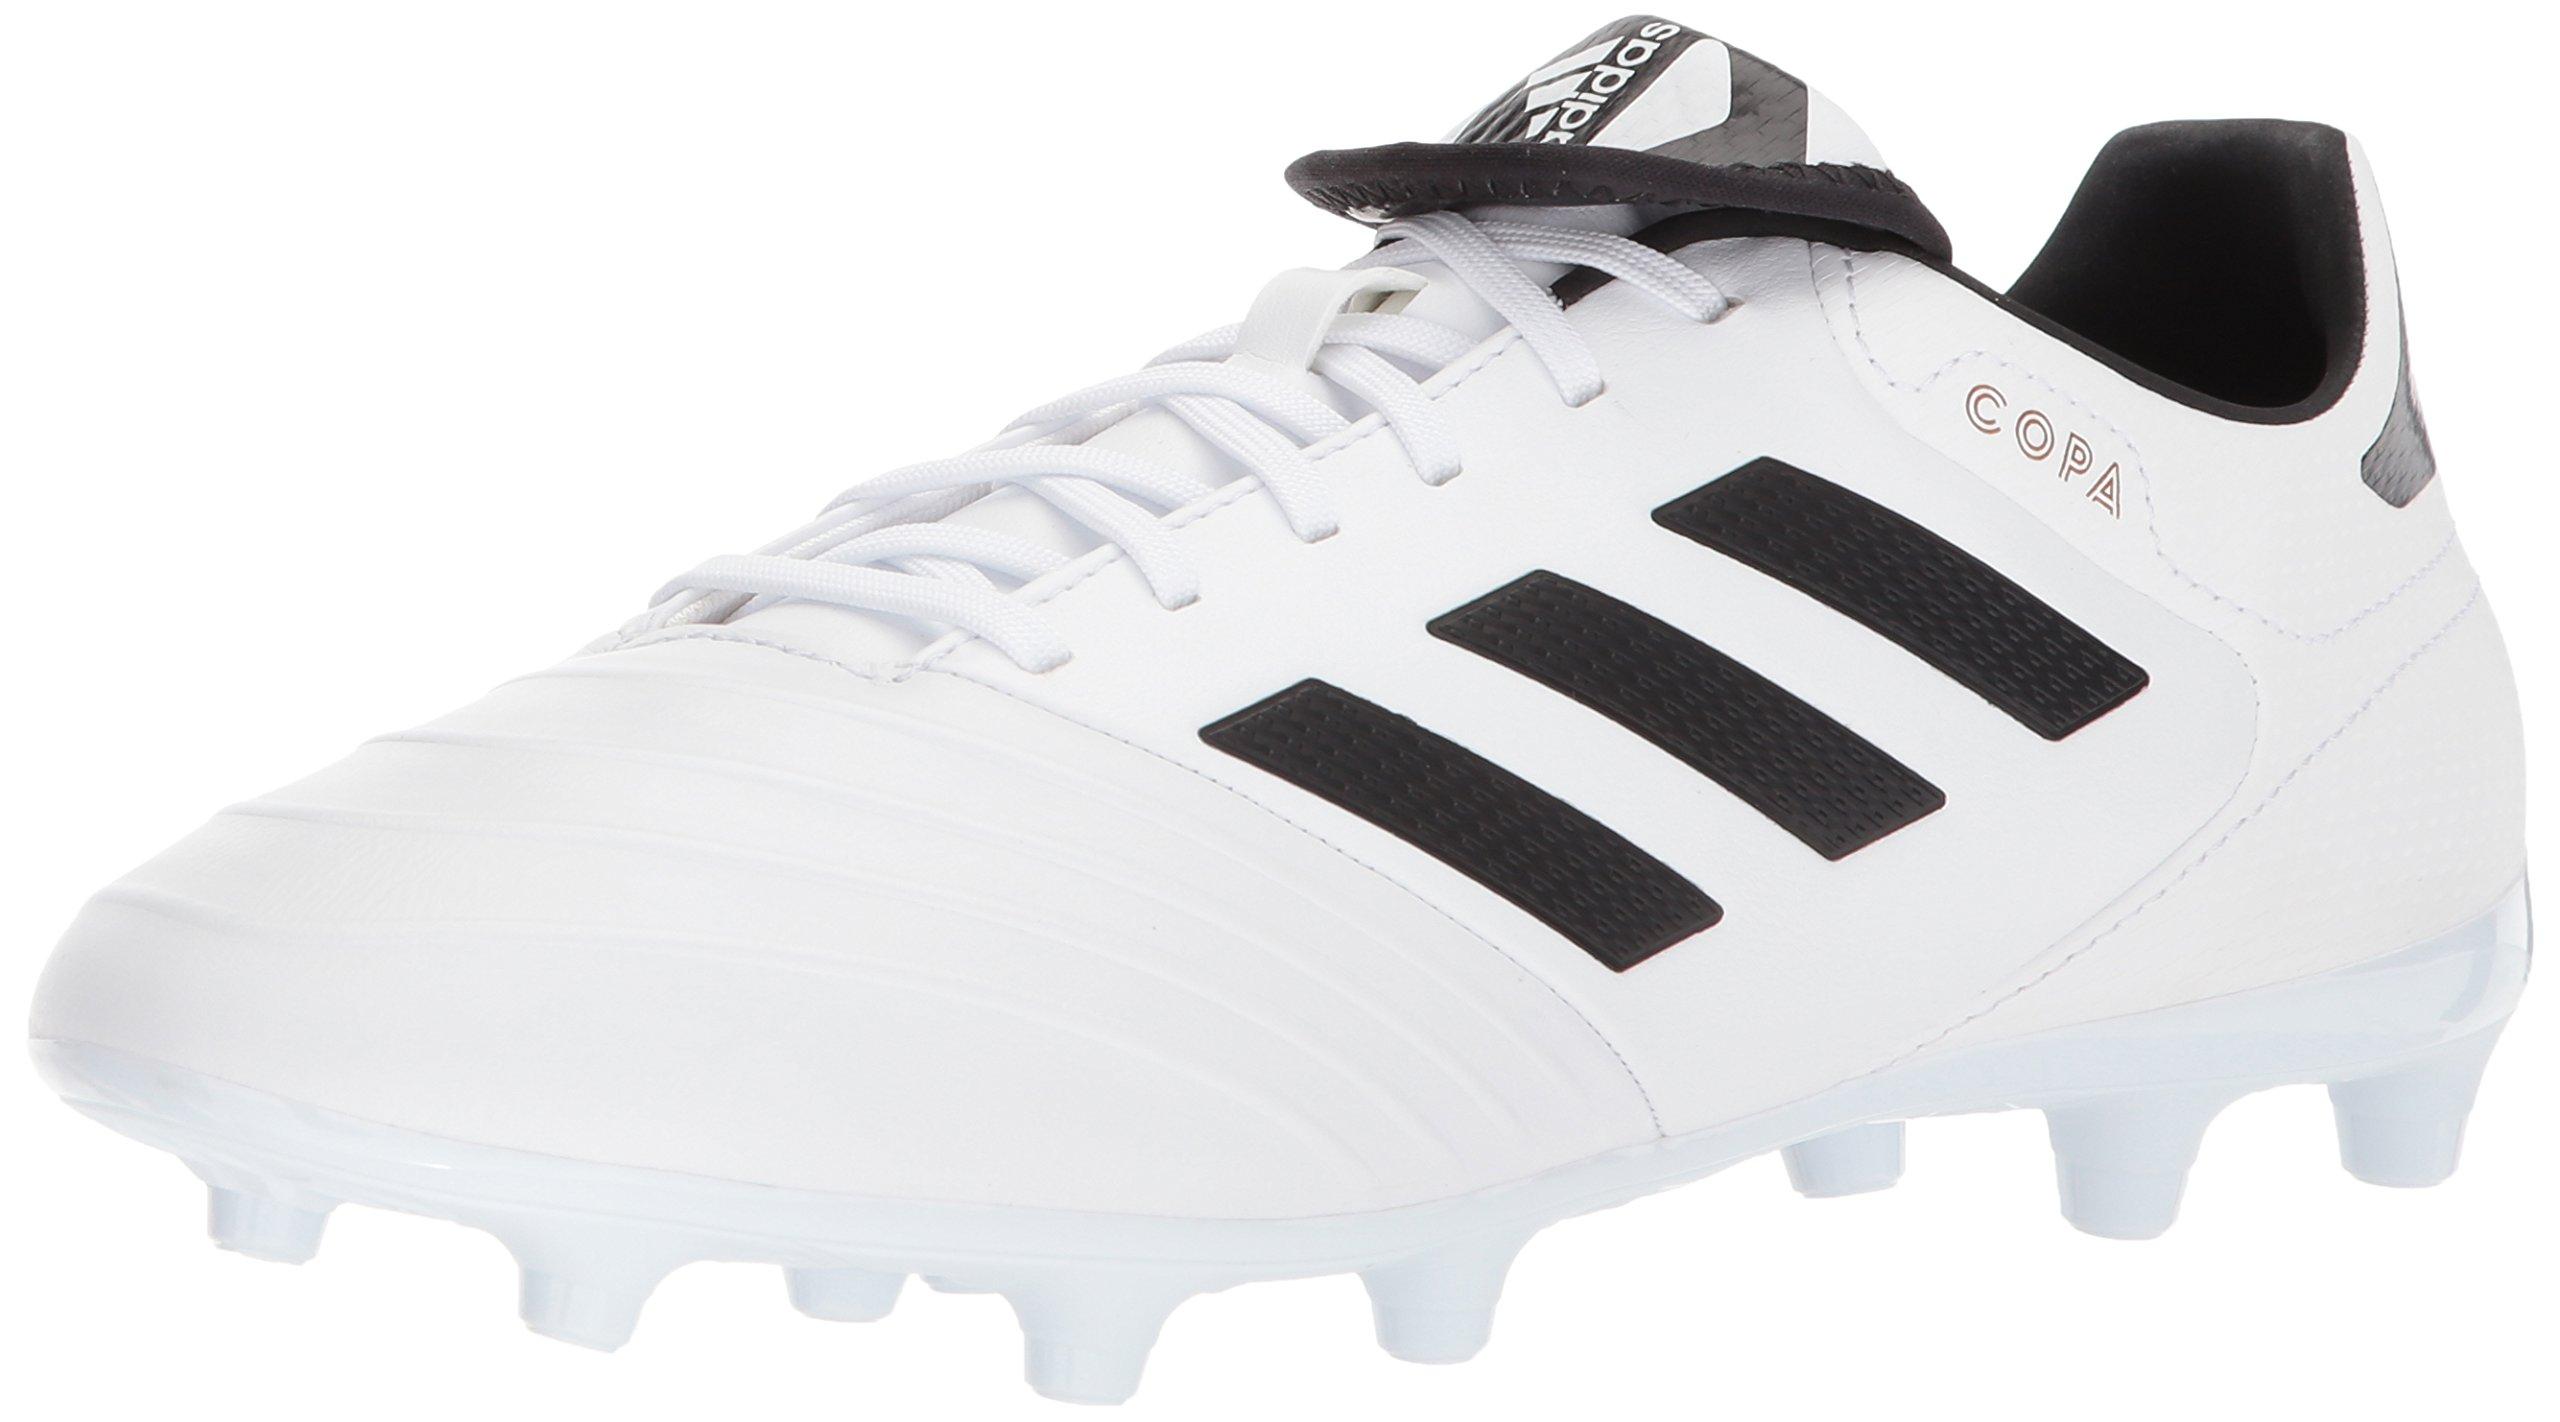 adidas Men's Copa 18.3 FG Soccer Shoe, White/Core Black/Tactile Gold, 9 M US by adidas